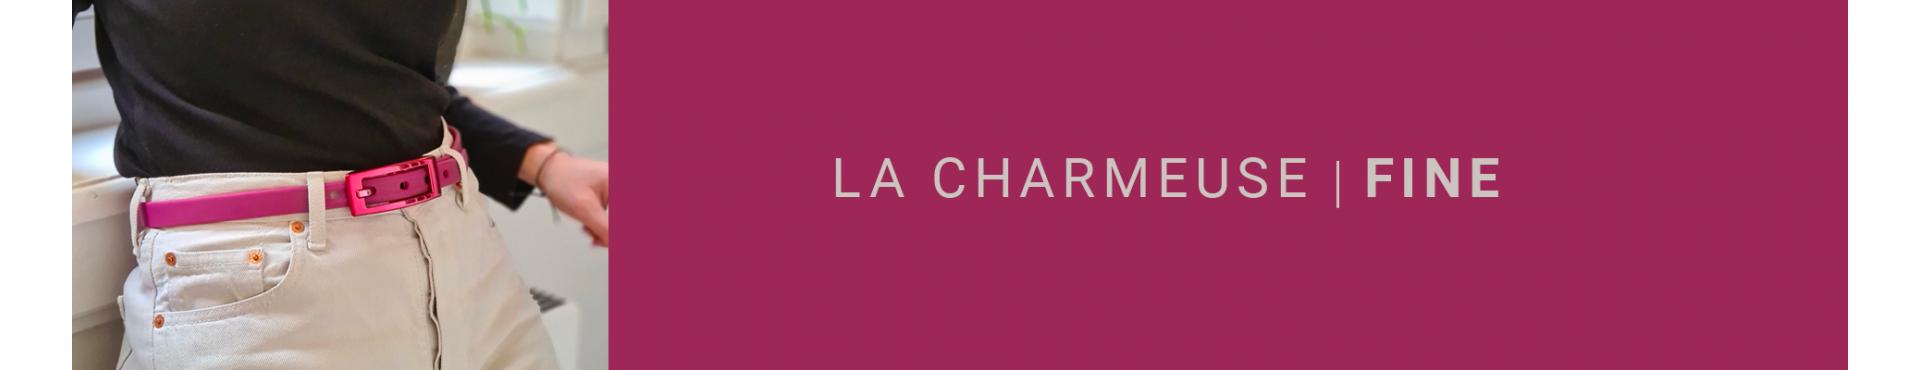 Plastic Belt La Charmeuse for Women